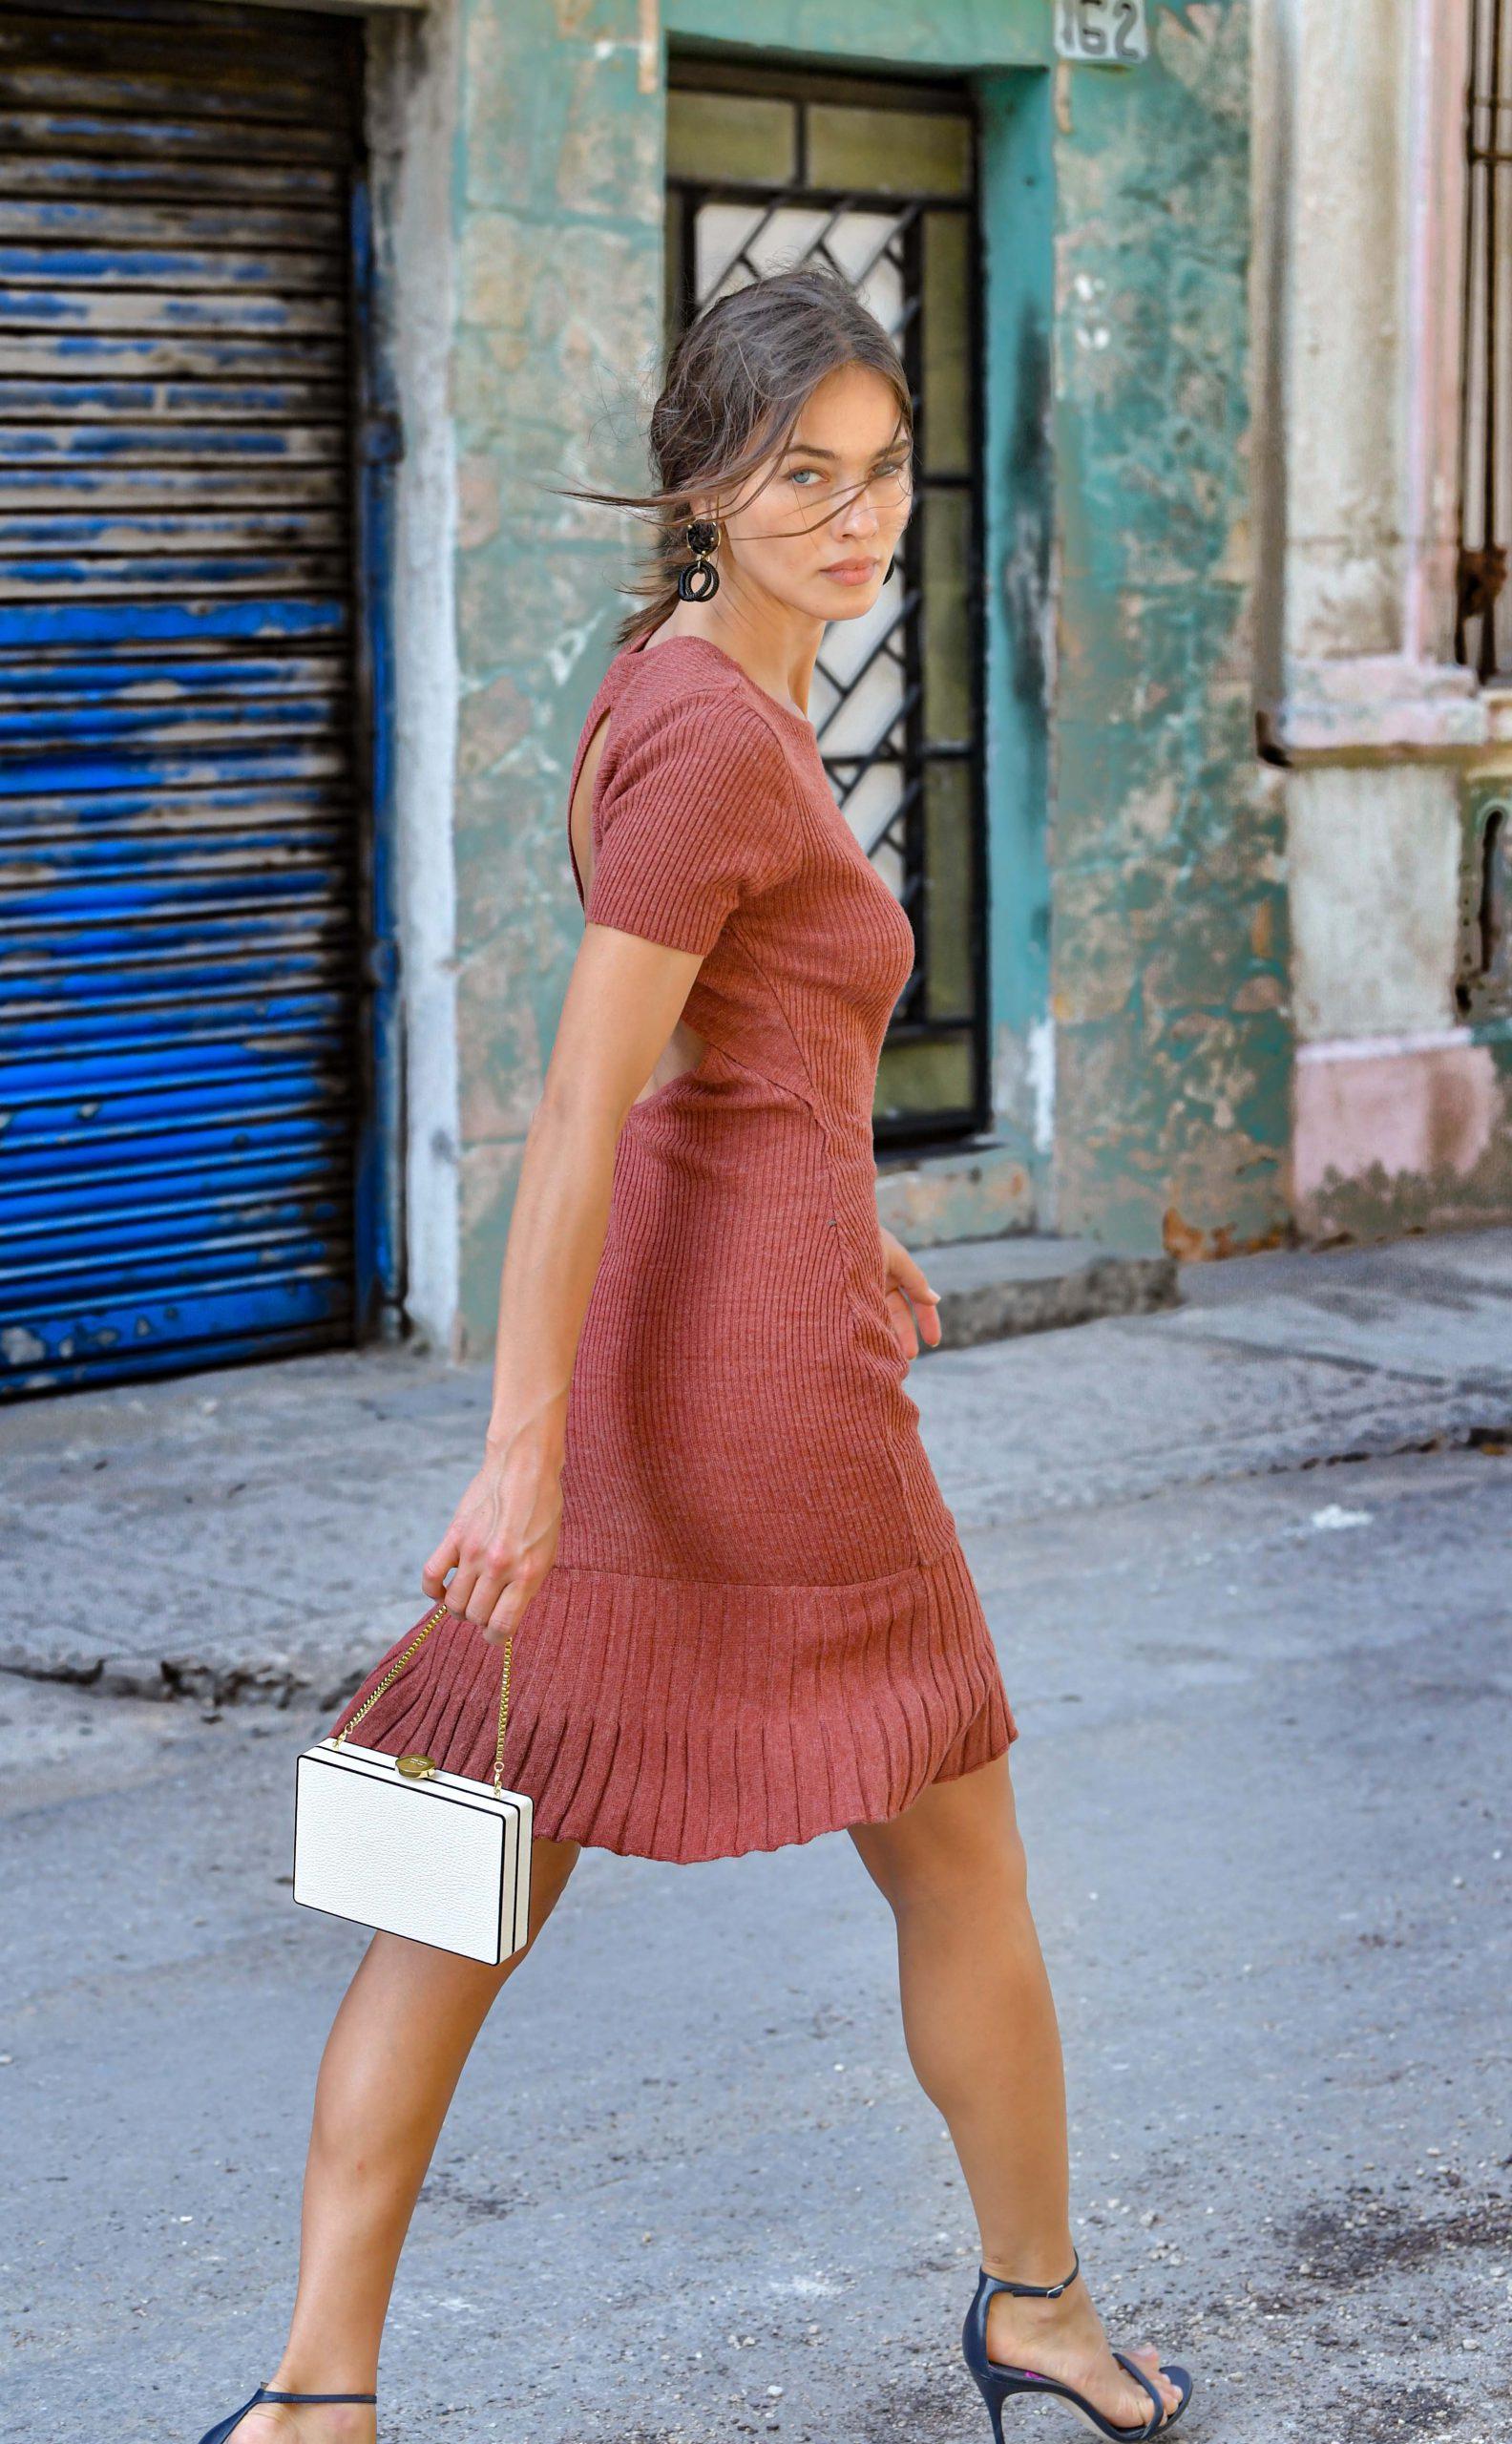 Comissioned for Frau Frieda Handbags 3